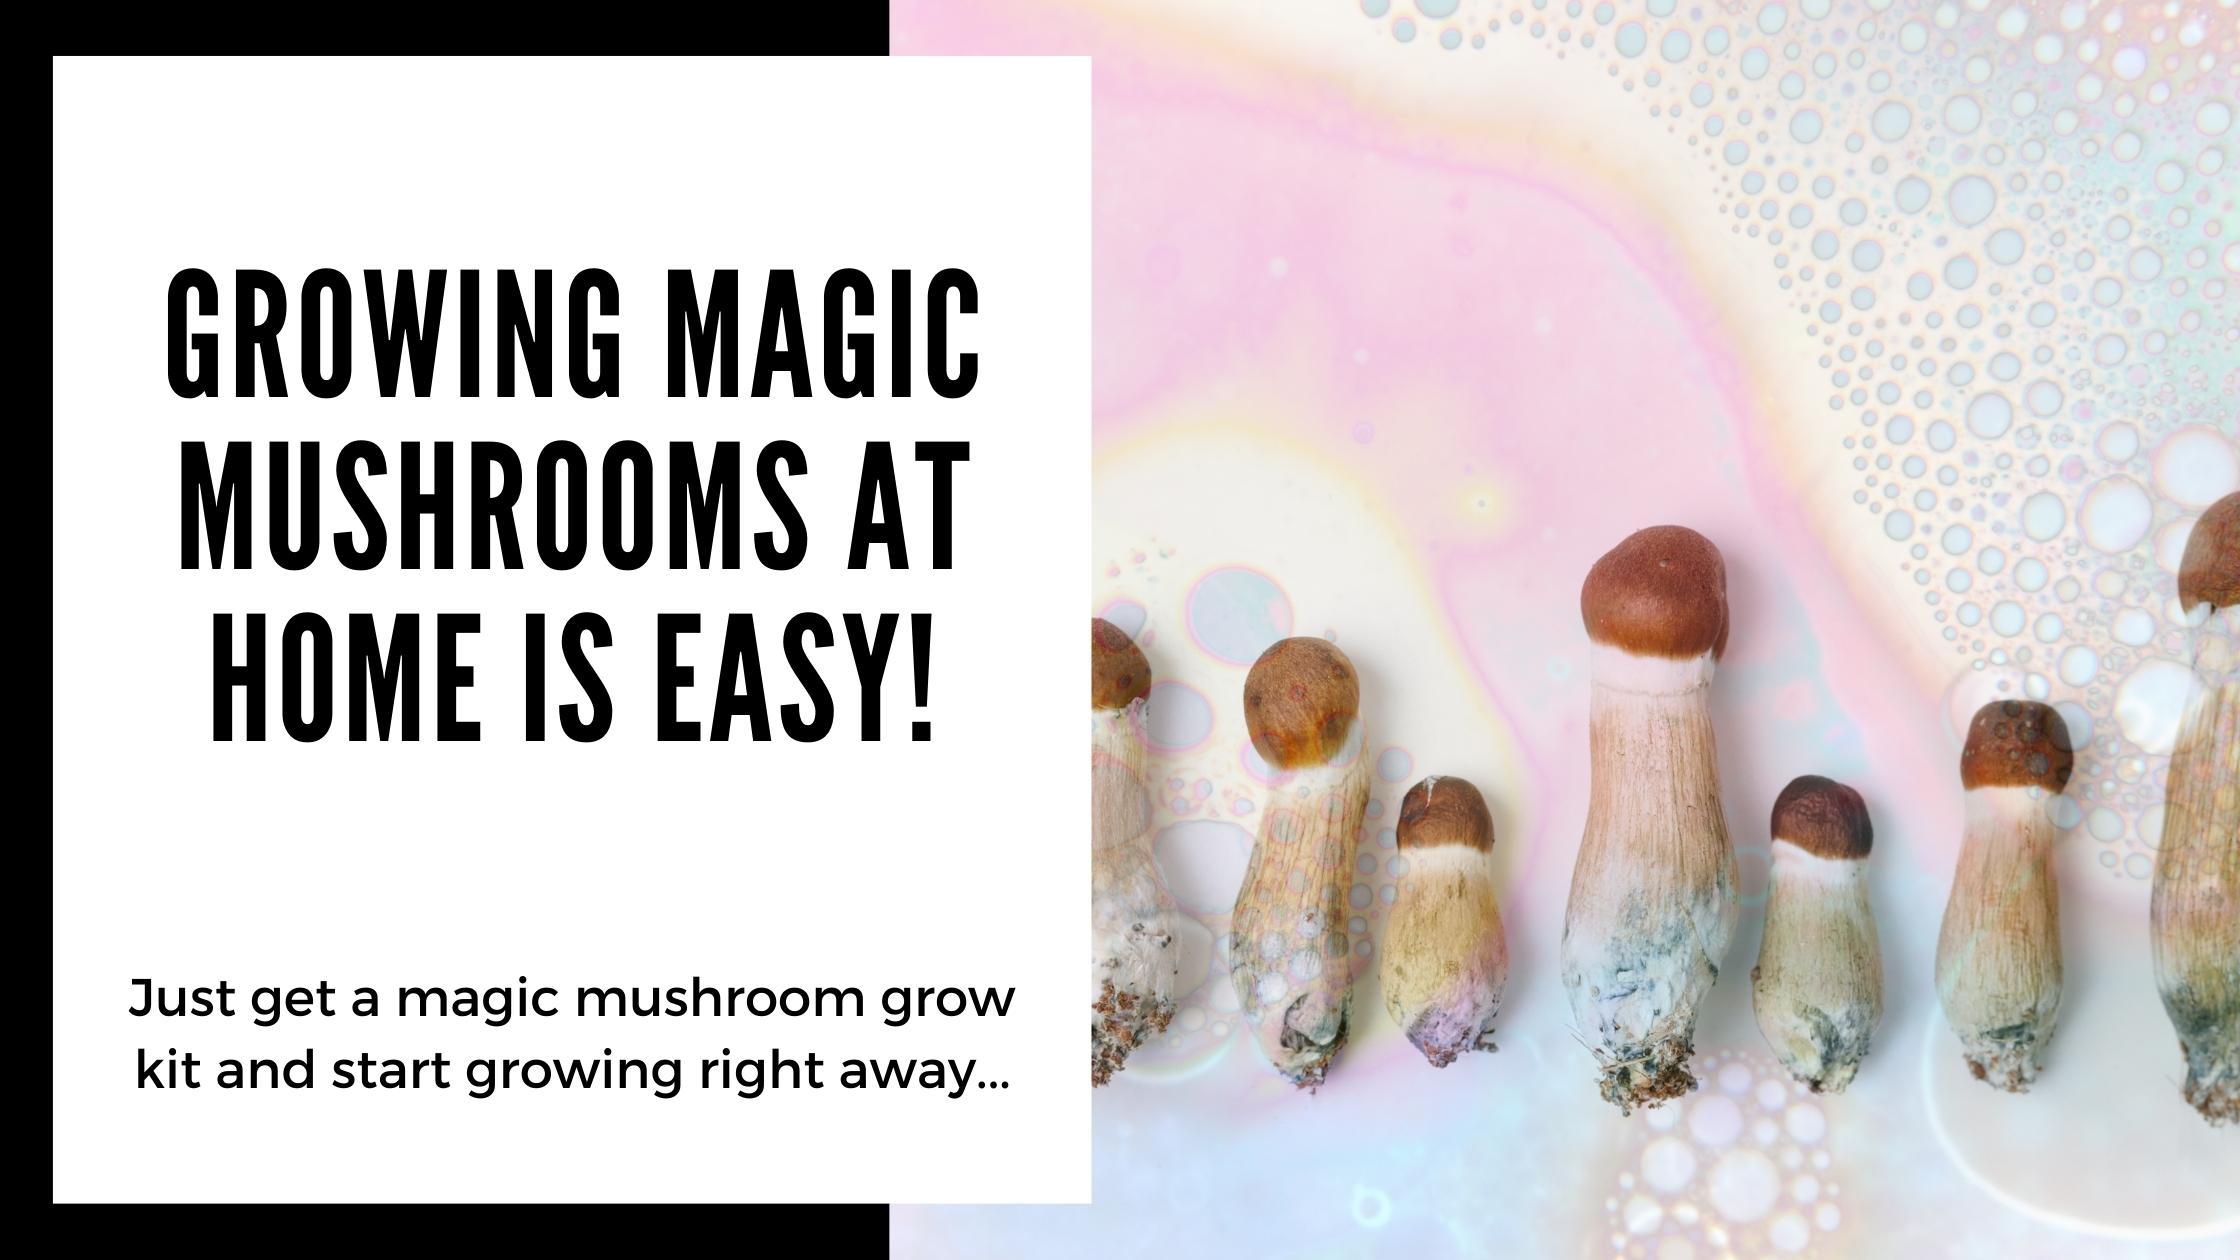 Magic Mushroom Grow Kit to grow magic mushrooms at home